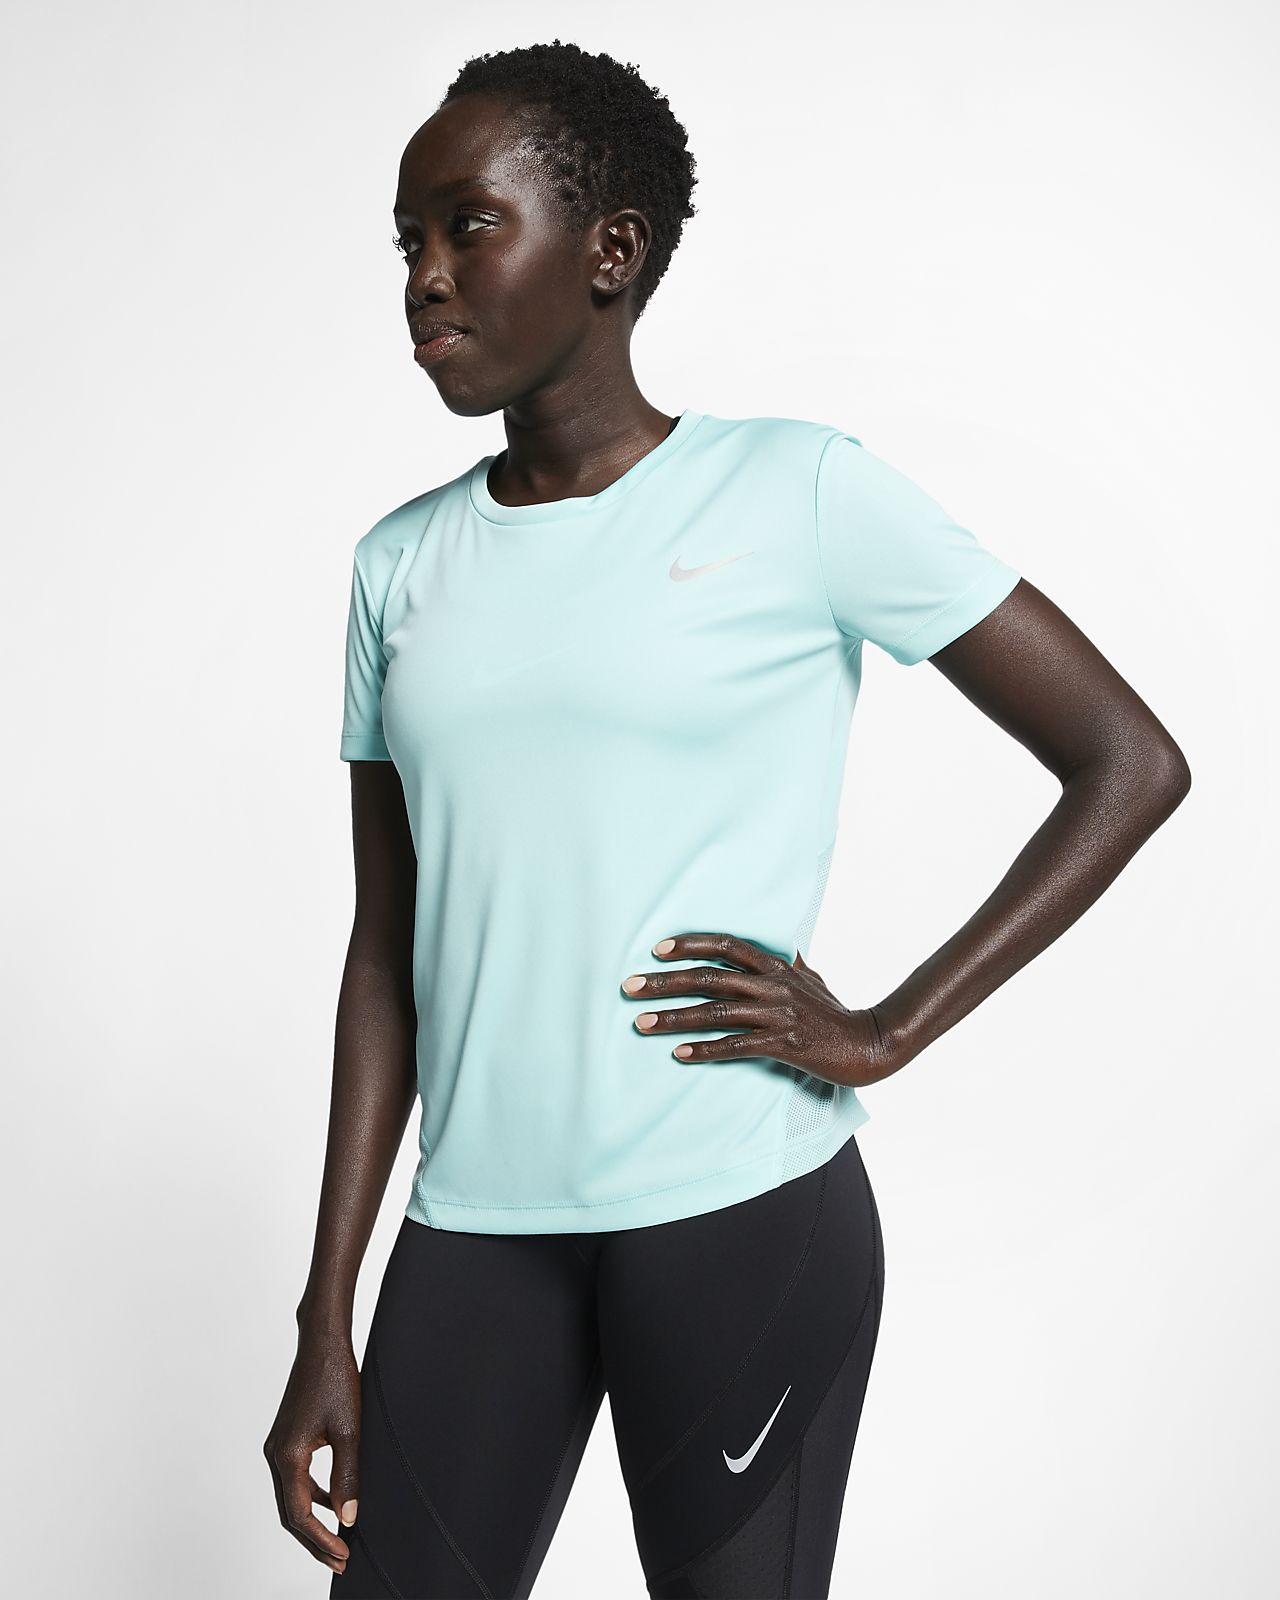 d514d9d203e3 Γυναικεία κοντομάνικη μπλούζα για τρέξιμο Nike Miler. Nike.com GR